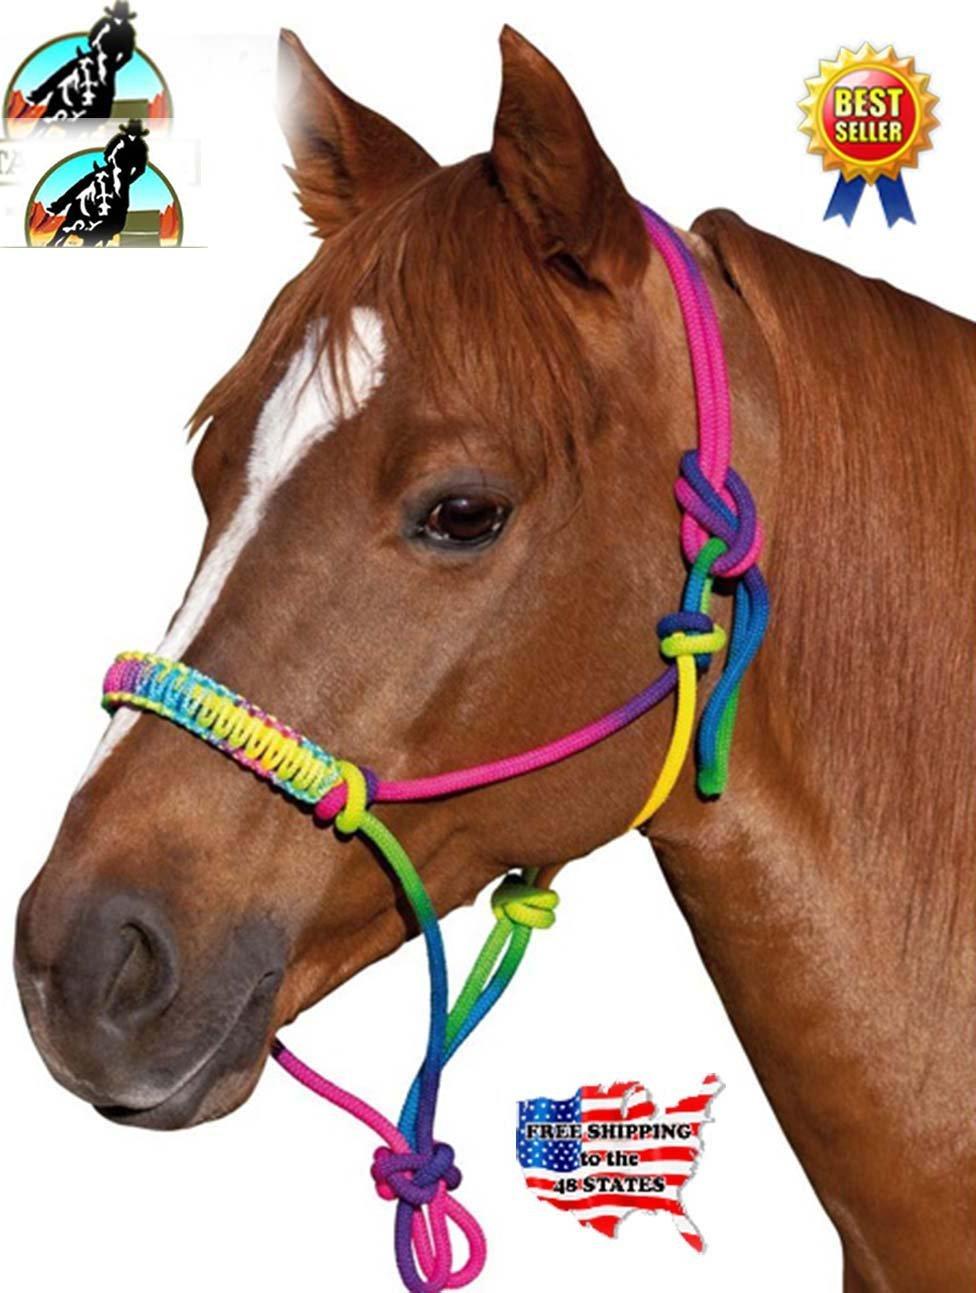 Buy Prorider Nylon Braided Horse Rope Halter Noseband Tack Rainbow 606120 In Cheap Price On Alibaba Com